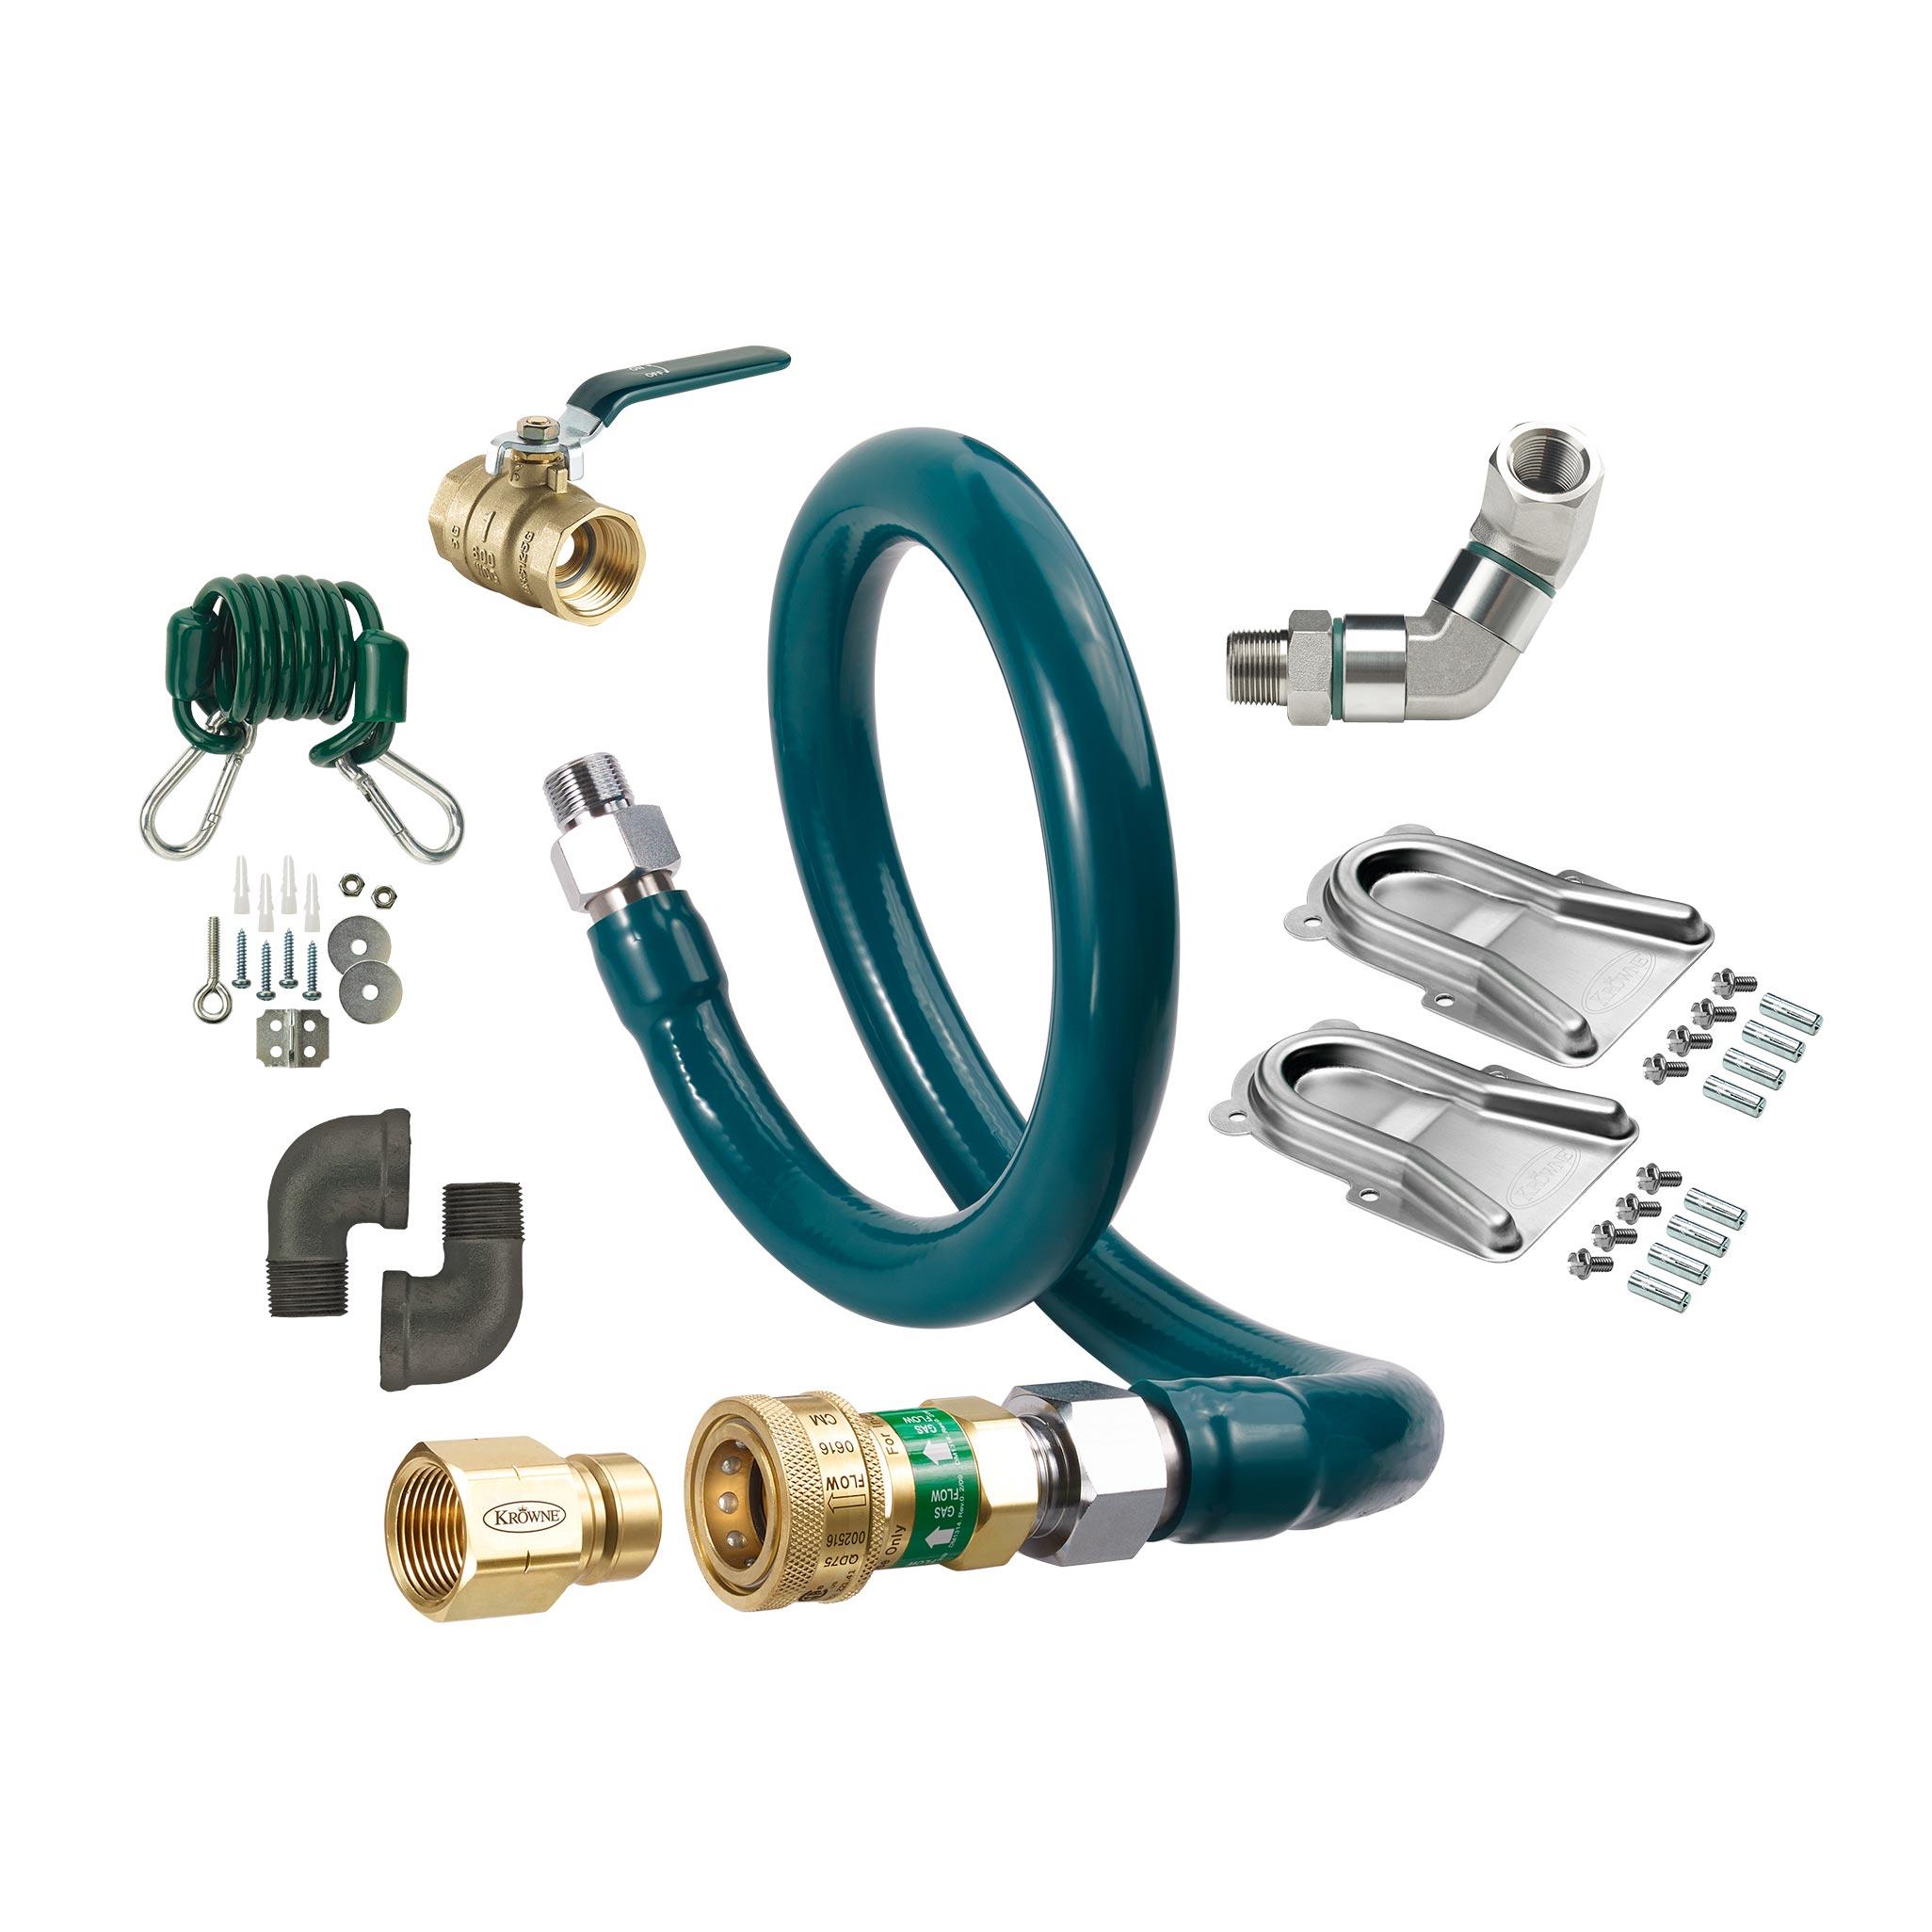 Krowne Metal M7572K11 gas connector hose kit